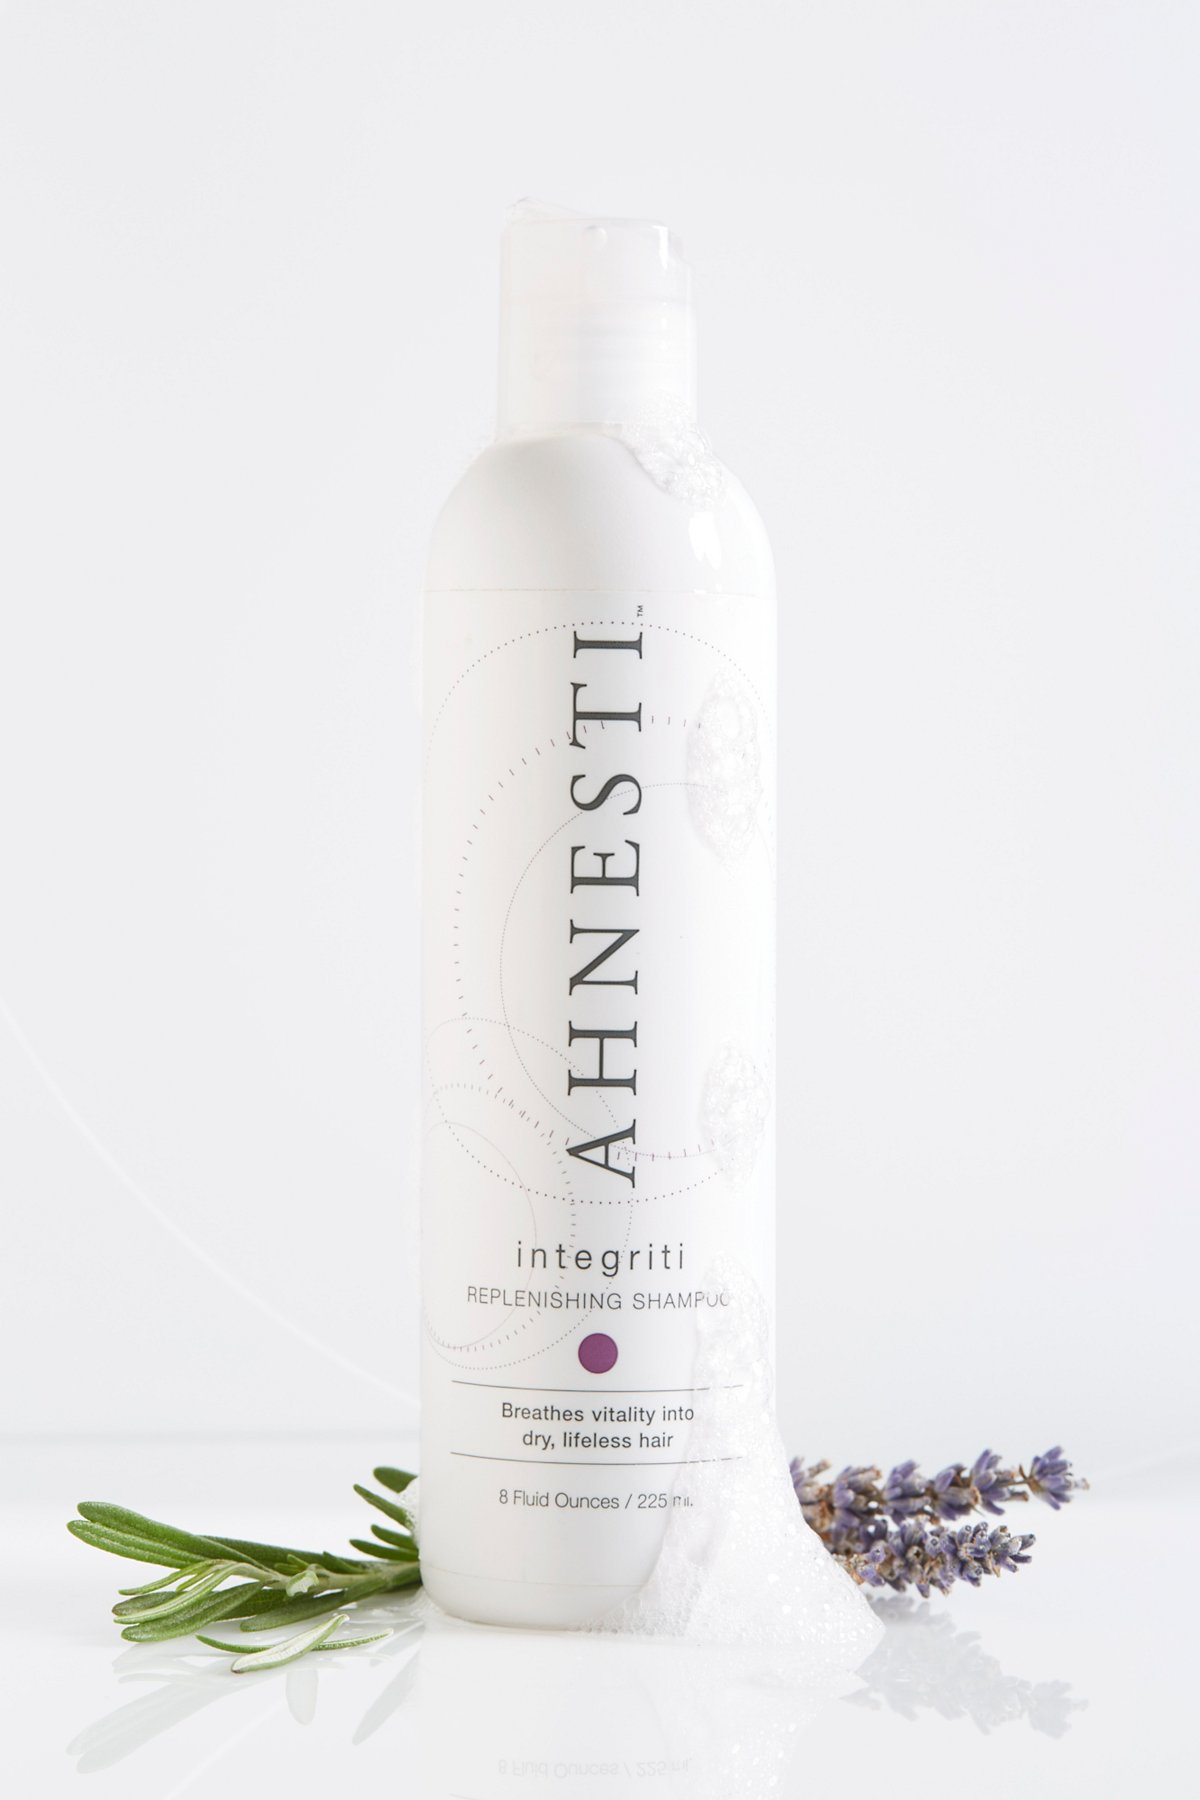 INTEGRITI Replenishing Shampoo